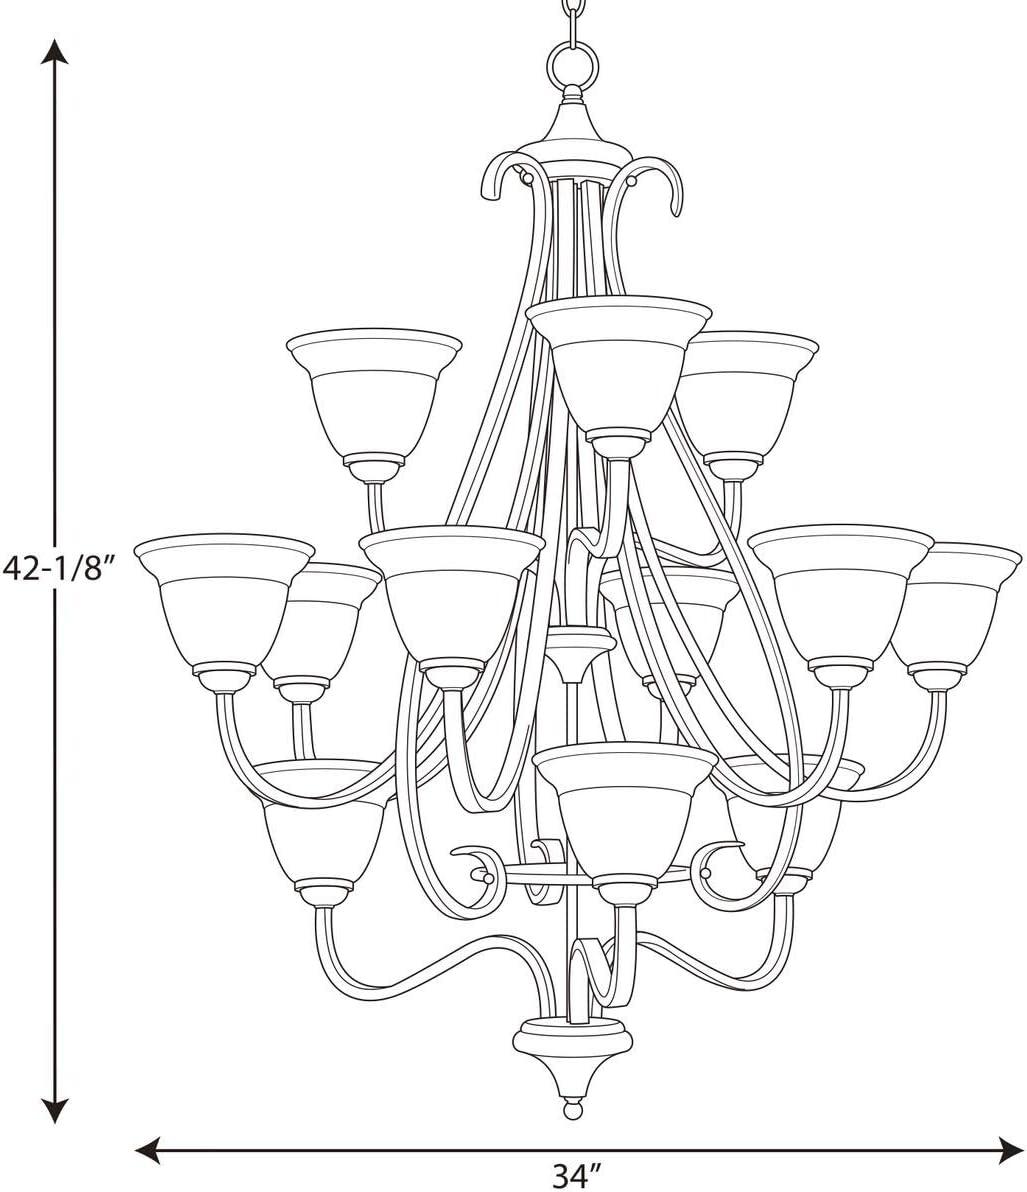 Progress Lighting P4419-77 Torino Twelve-Light Foyer Pendant, 34 x 42-1 8 , Forged Bronze